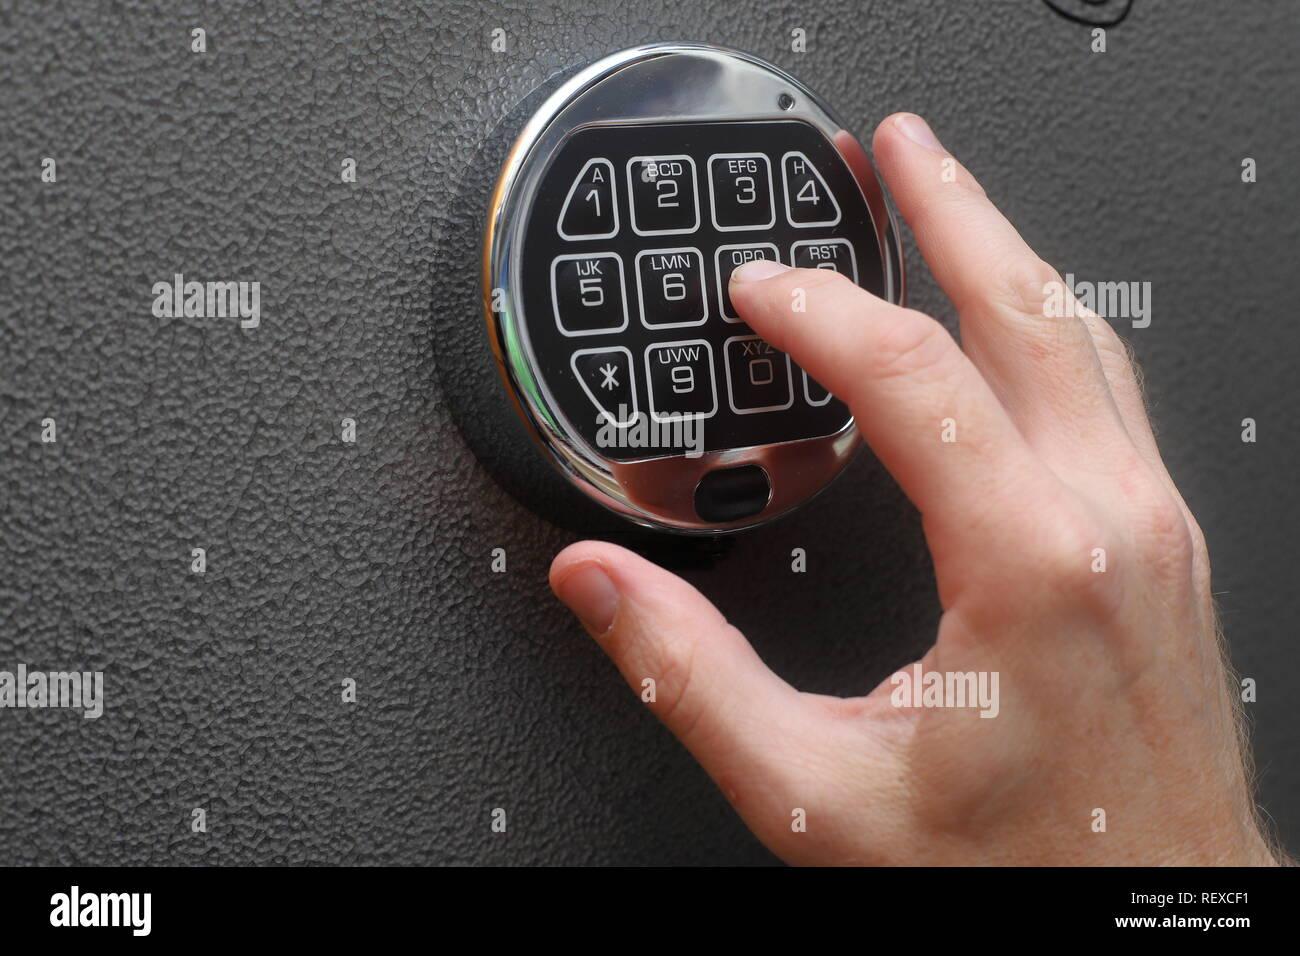 Hands entering combination to open digital lock on safe